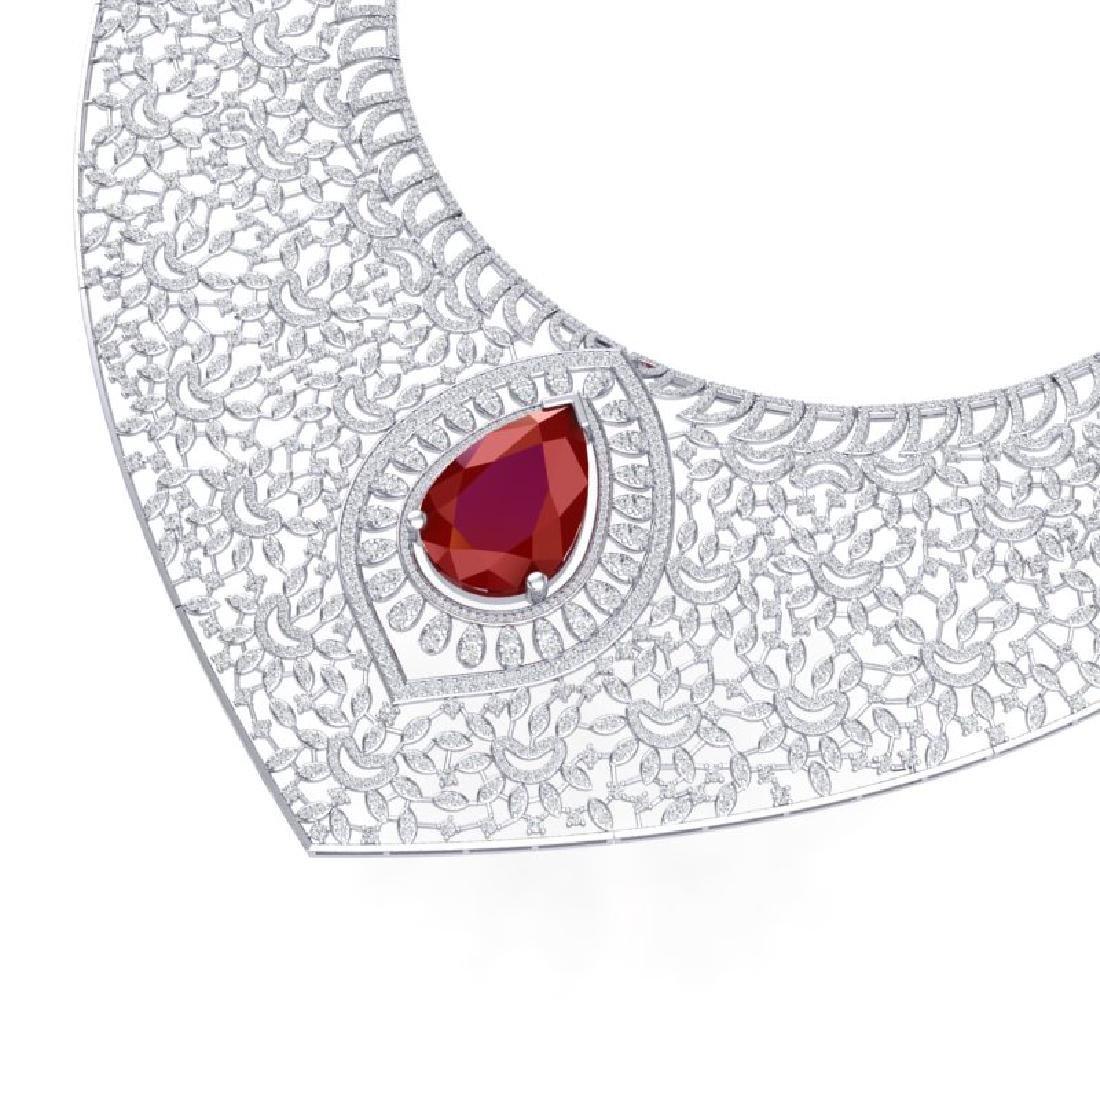 63.93 CTW Royalty Ruby & VS Diamond Necklace 18K White